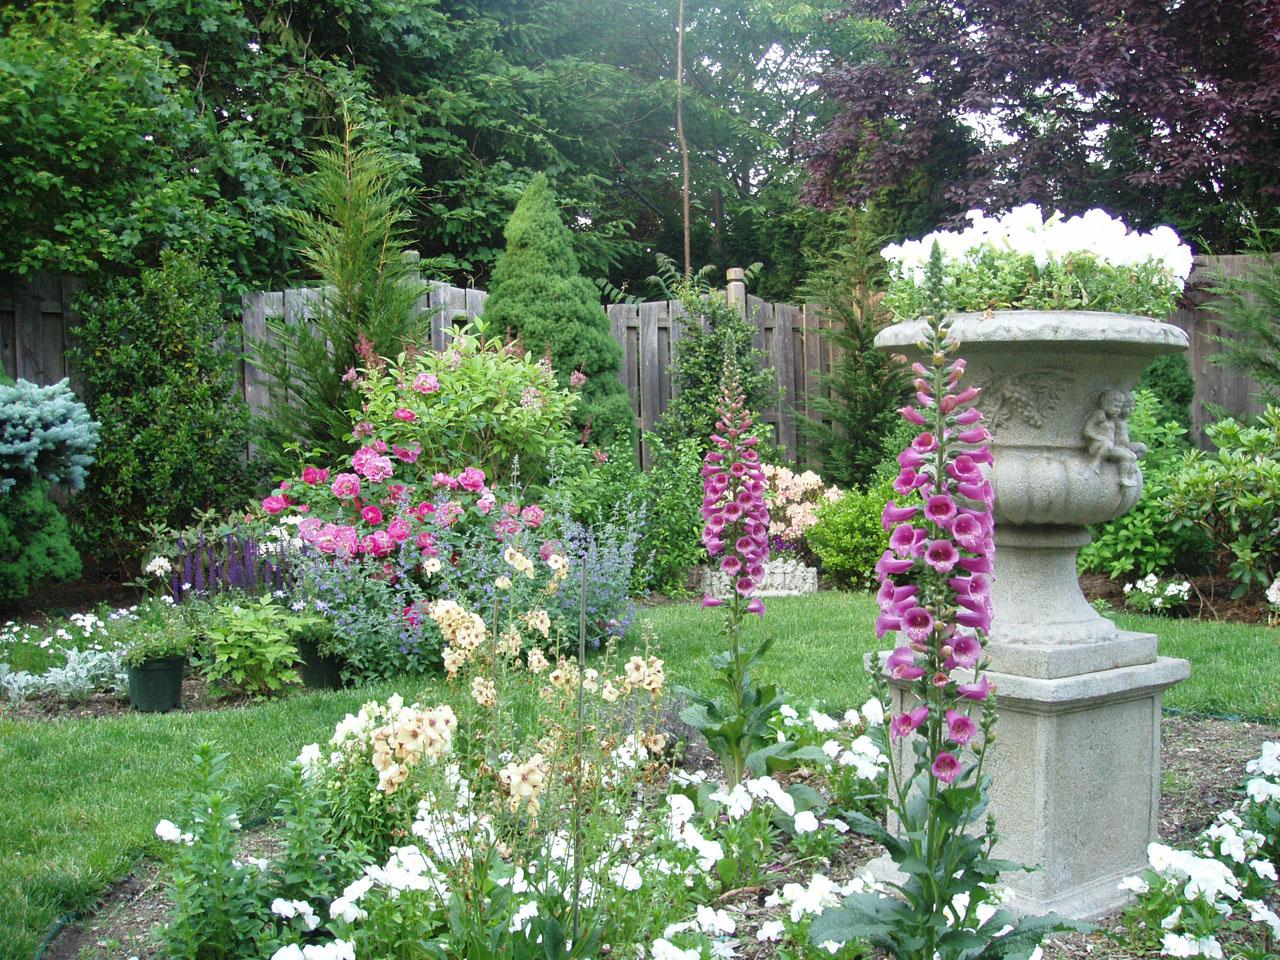 English garden design iskn design on vine english garden design iskn workwithnaturefo